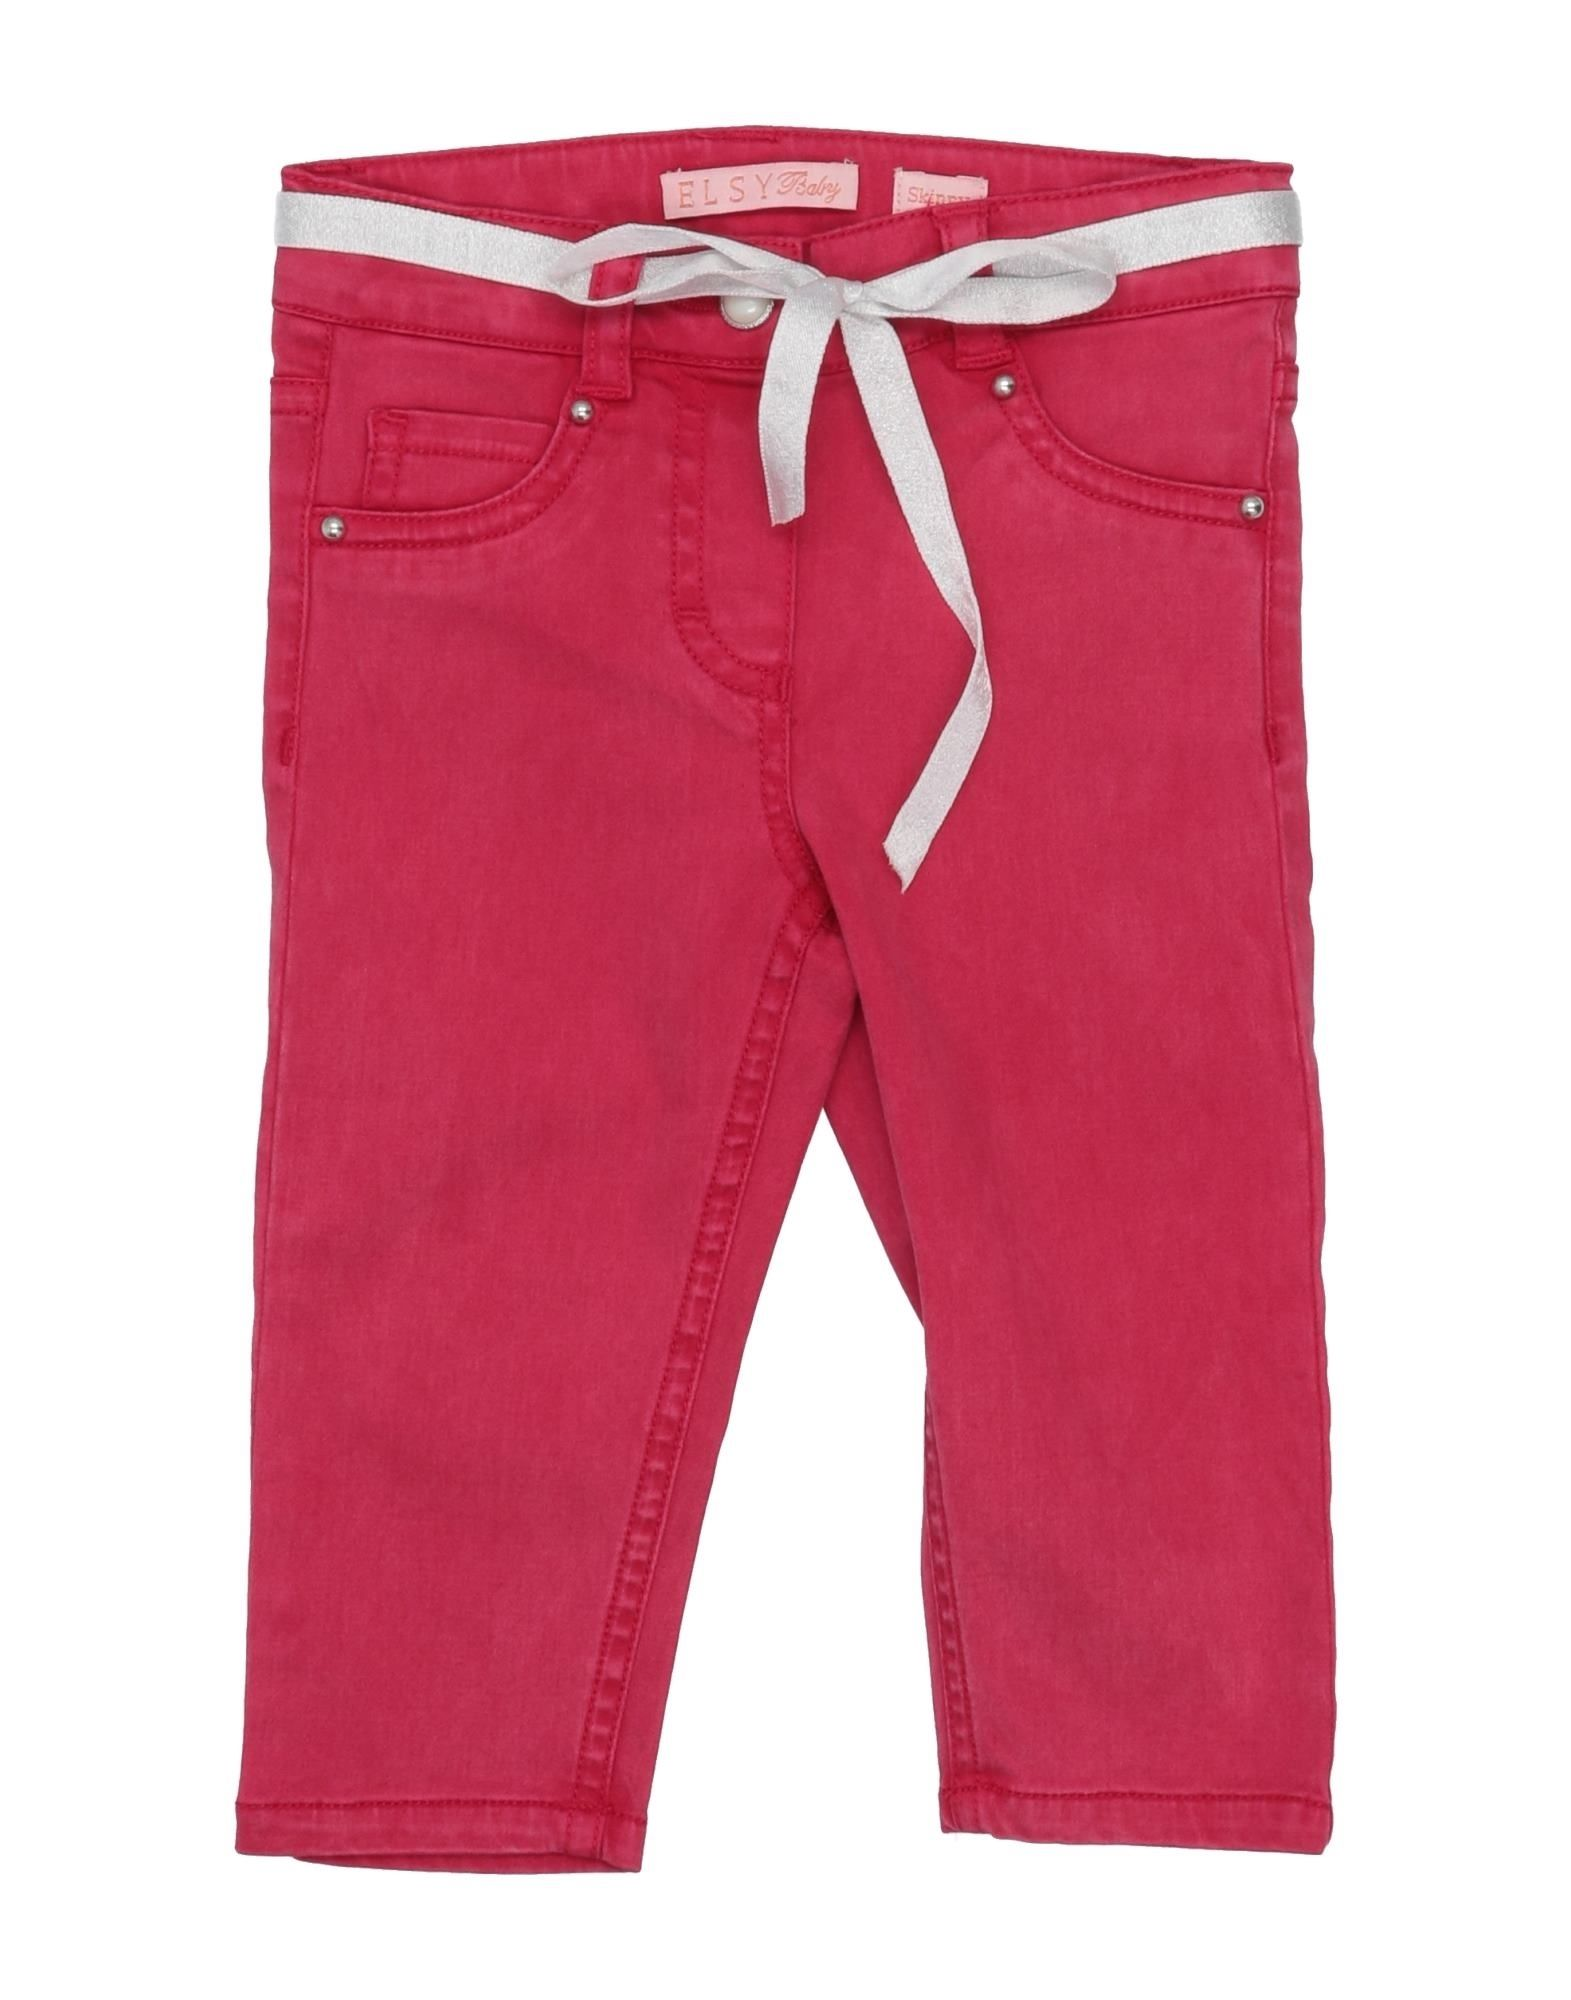 Elsy Kids' Casual Pants In Fuchsia